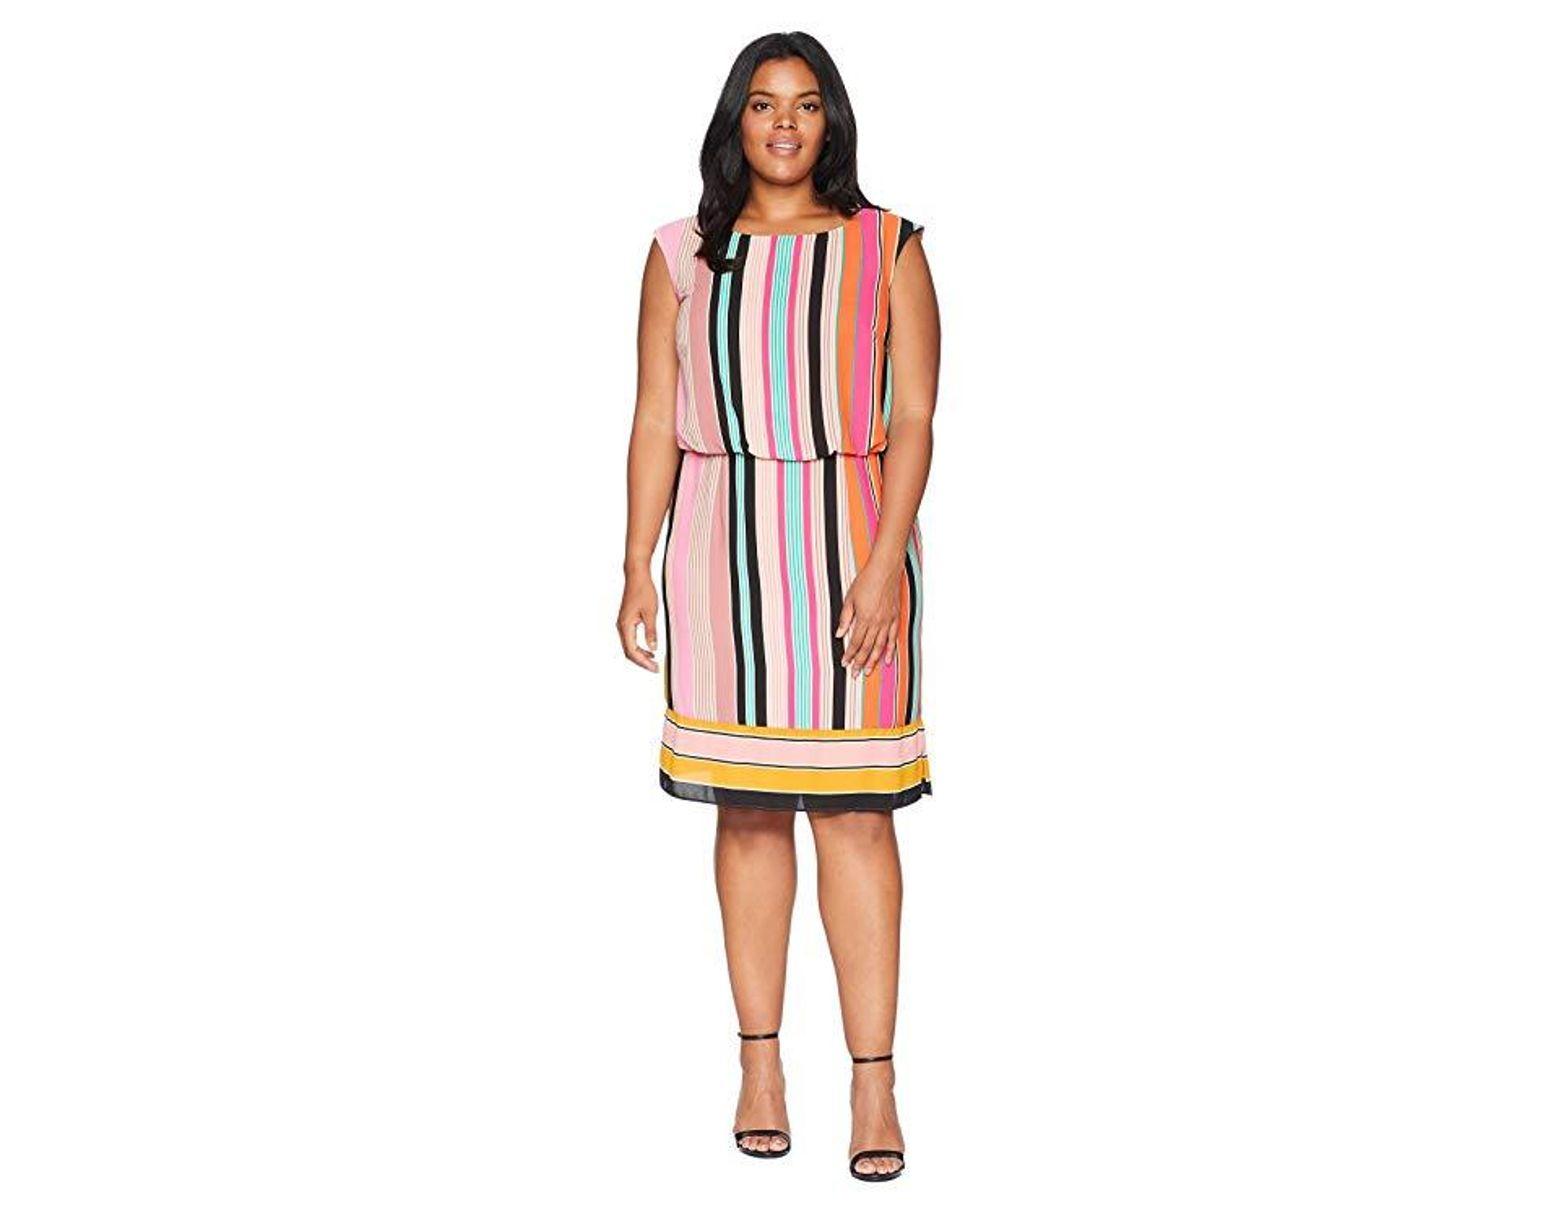 604348b5ee8 Adrianna Papell Plus Size Fiesta Stripe Blouson Dress (pink Multi) Dress in  Pink - Save 13% - Lyst